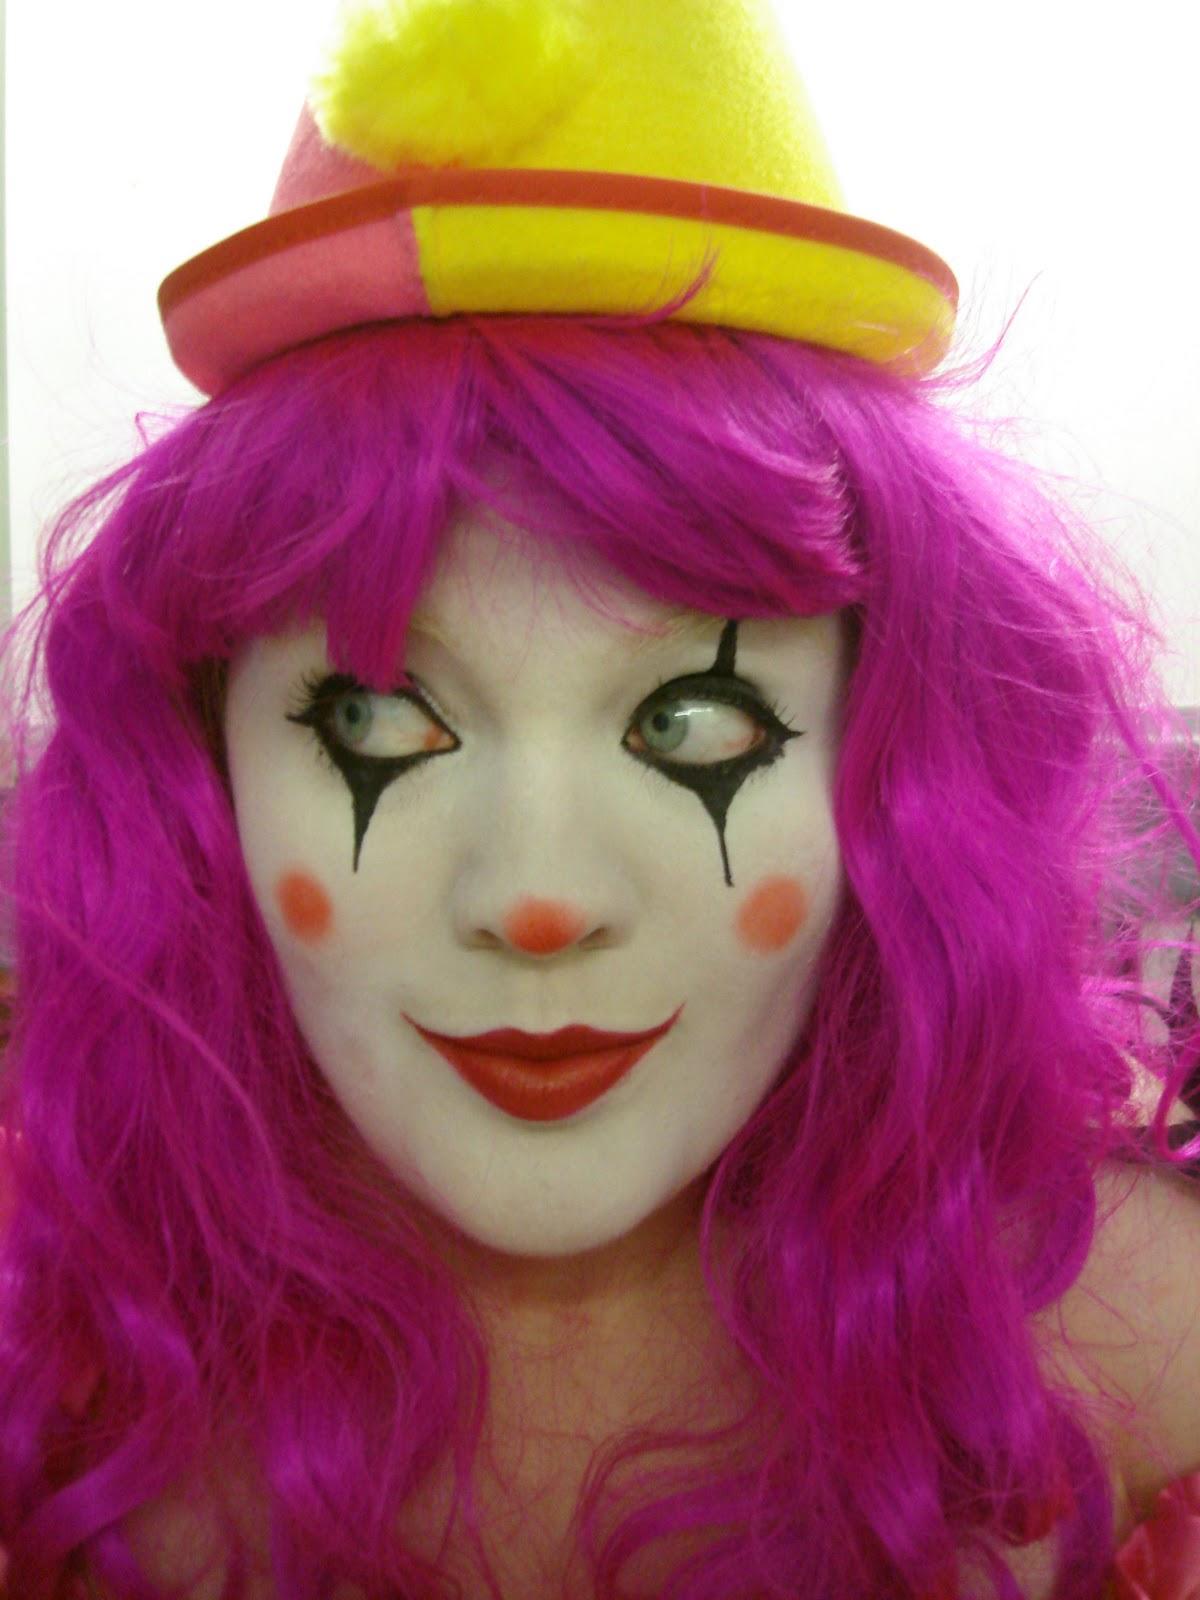 Realistic Elephant Tattoos   183  Alyson Hannigan Fat   183  Internet Safety    Happy Clown Faces Makeup